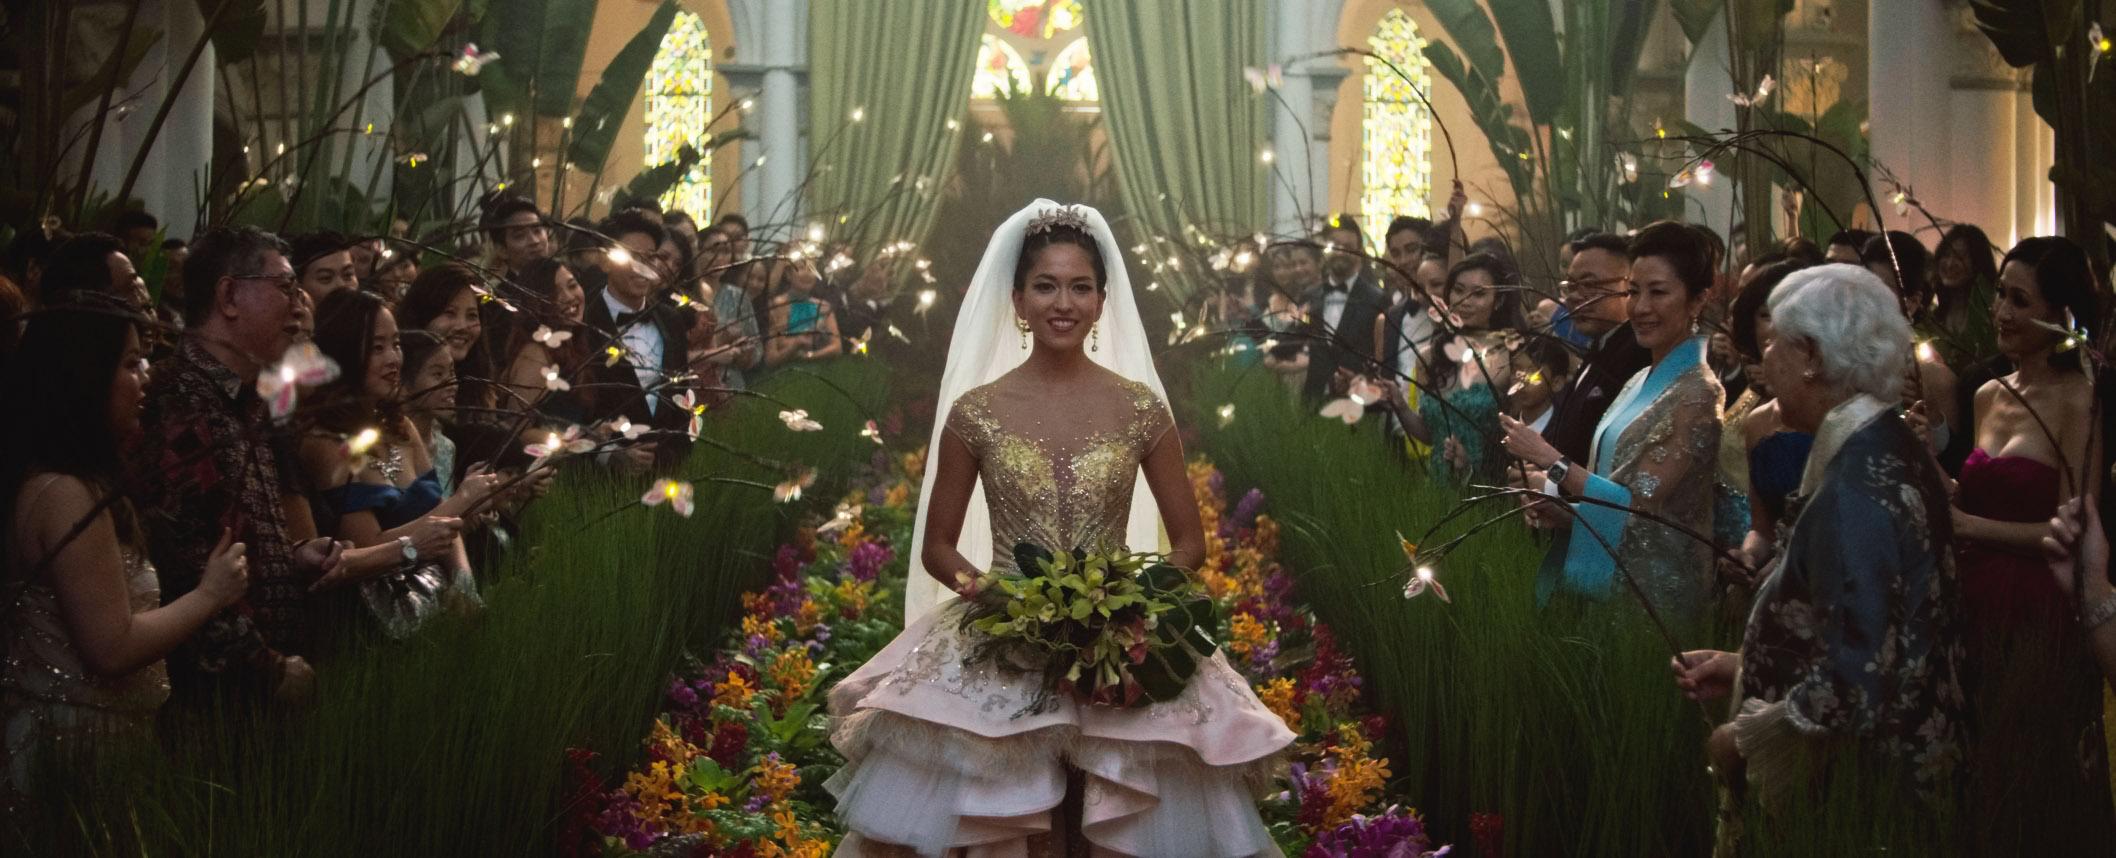 Crazy Rich Asians (2018) - IMDb